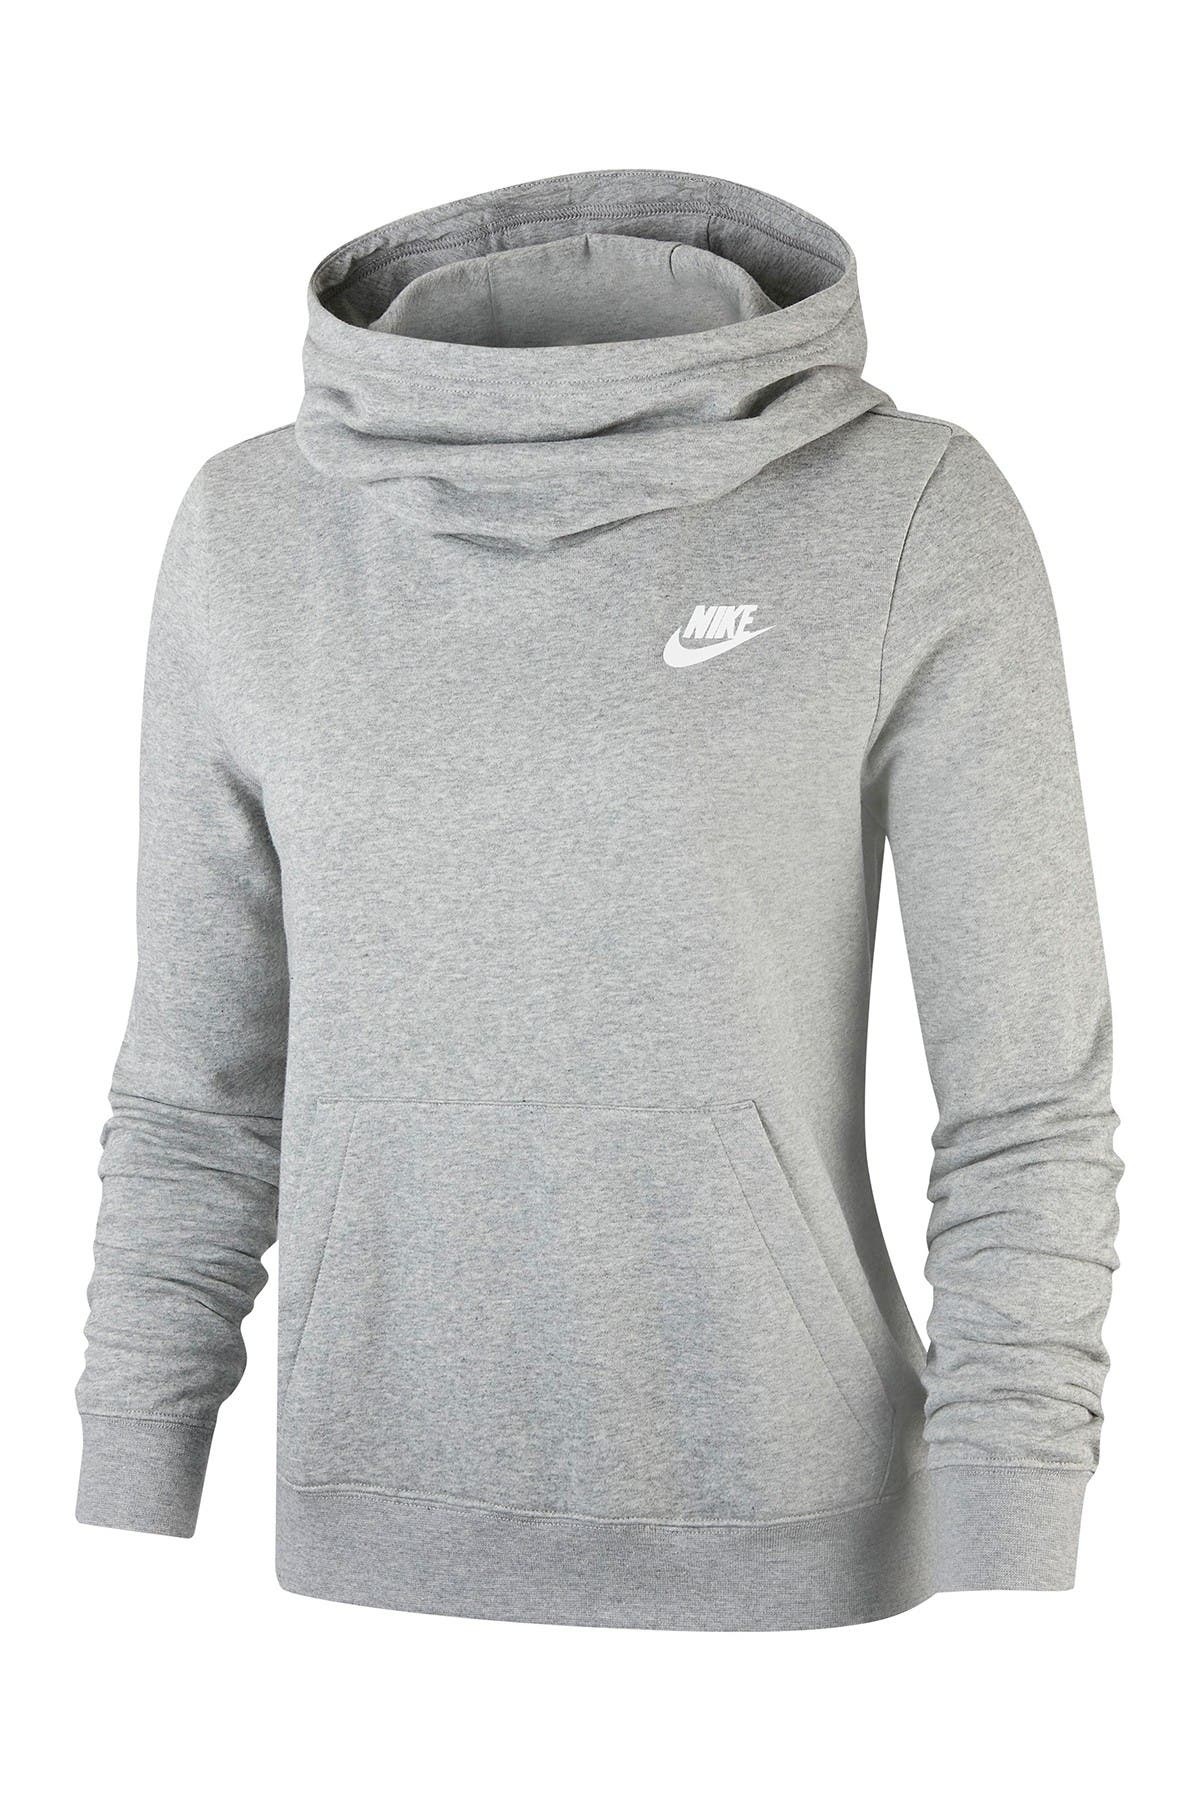 Image of Nike Funnel Neck Fleece Lined Varsity Hooded Pullover